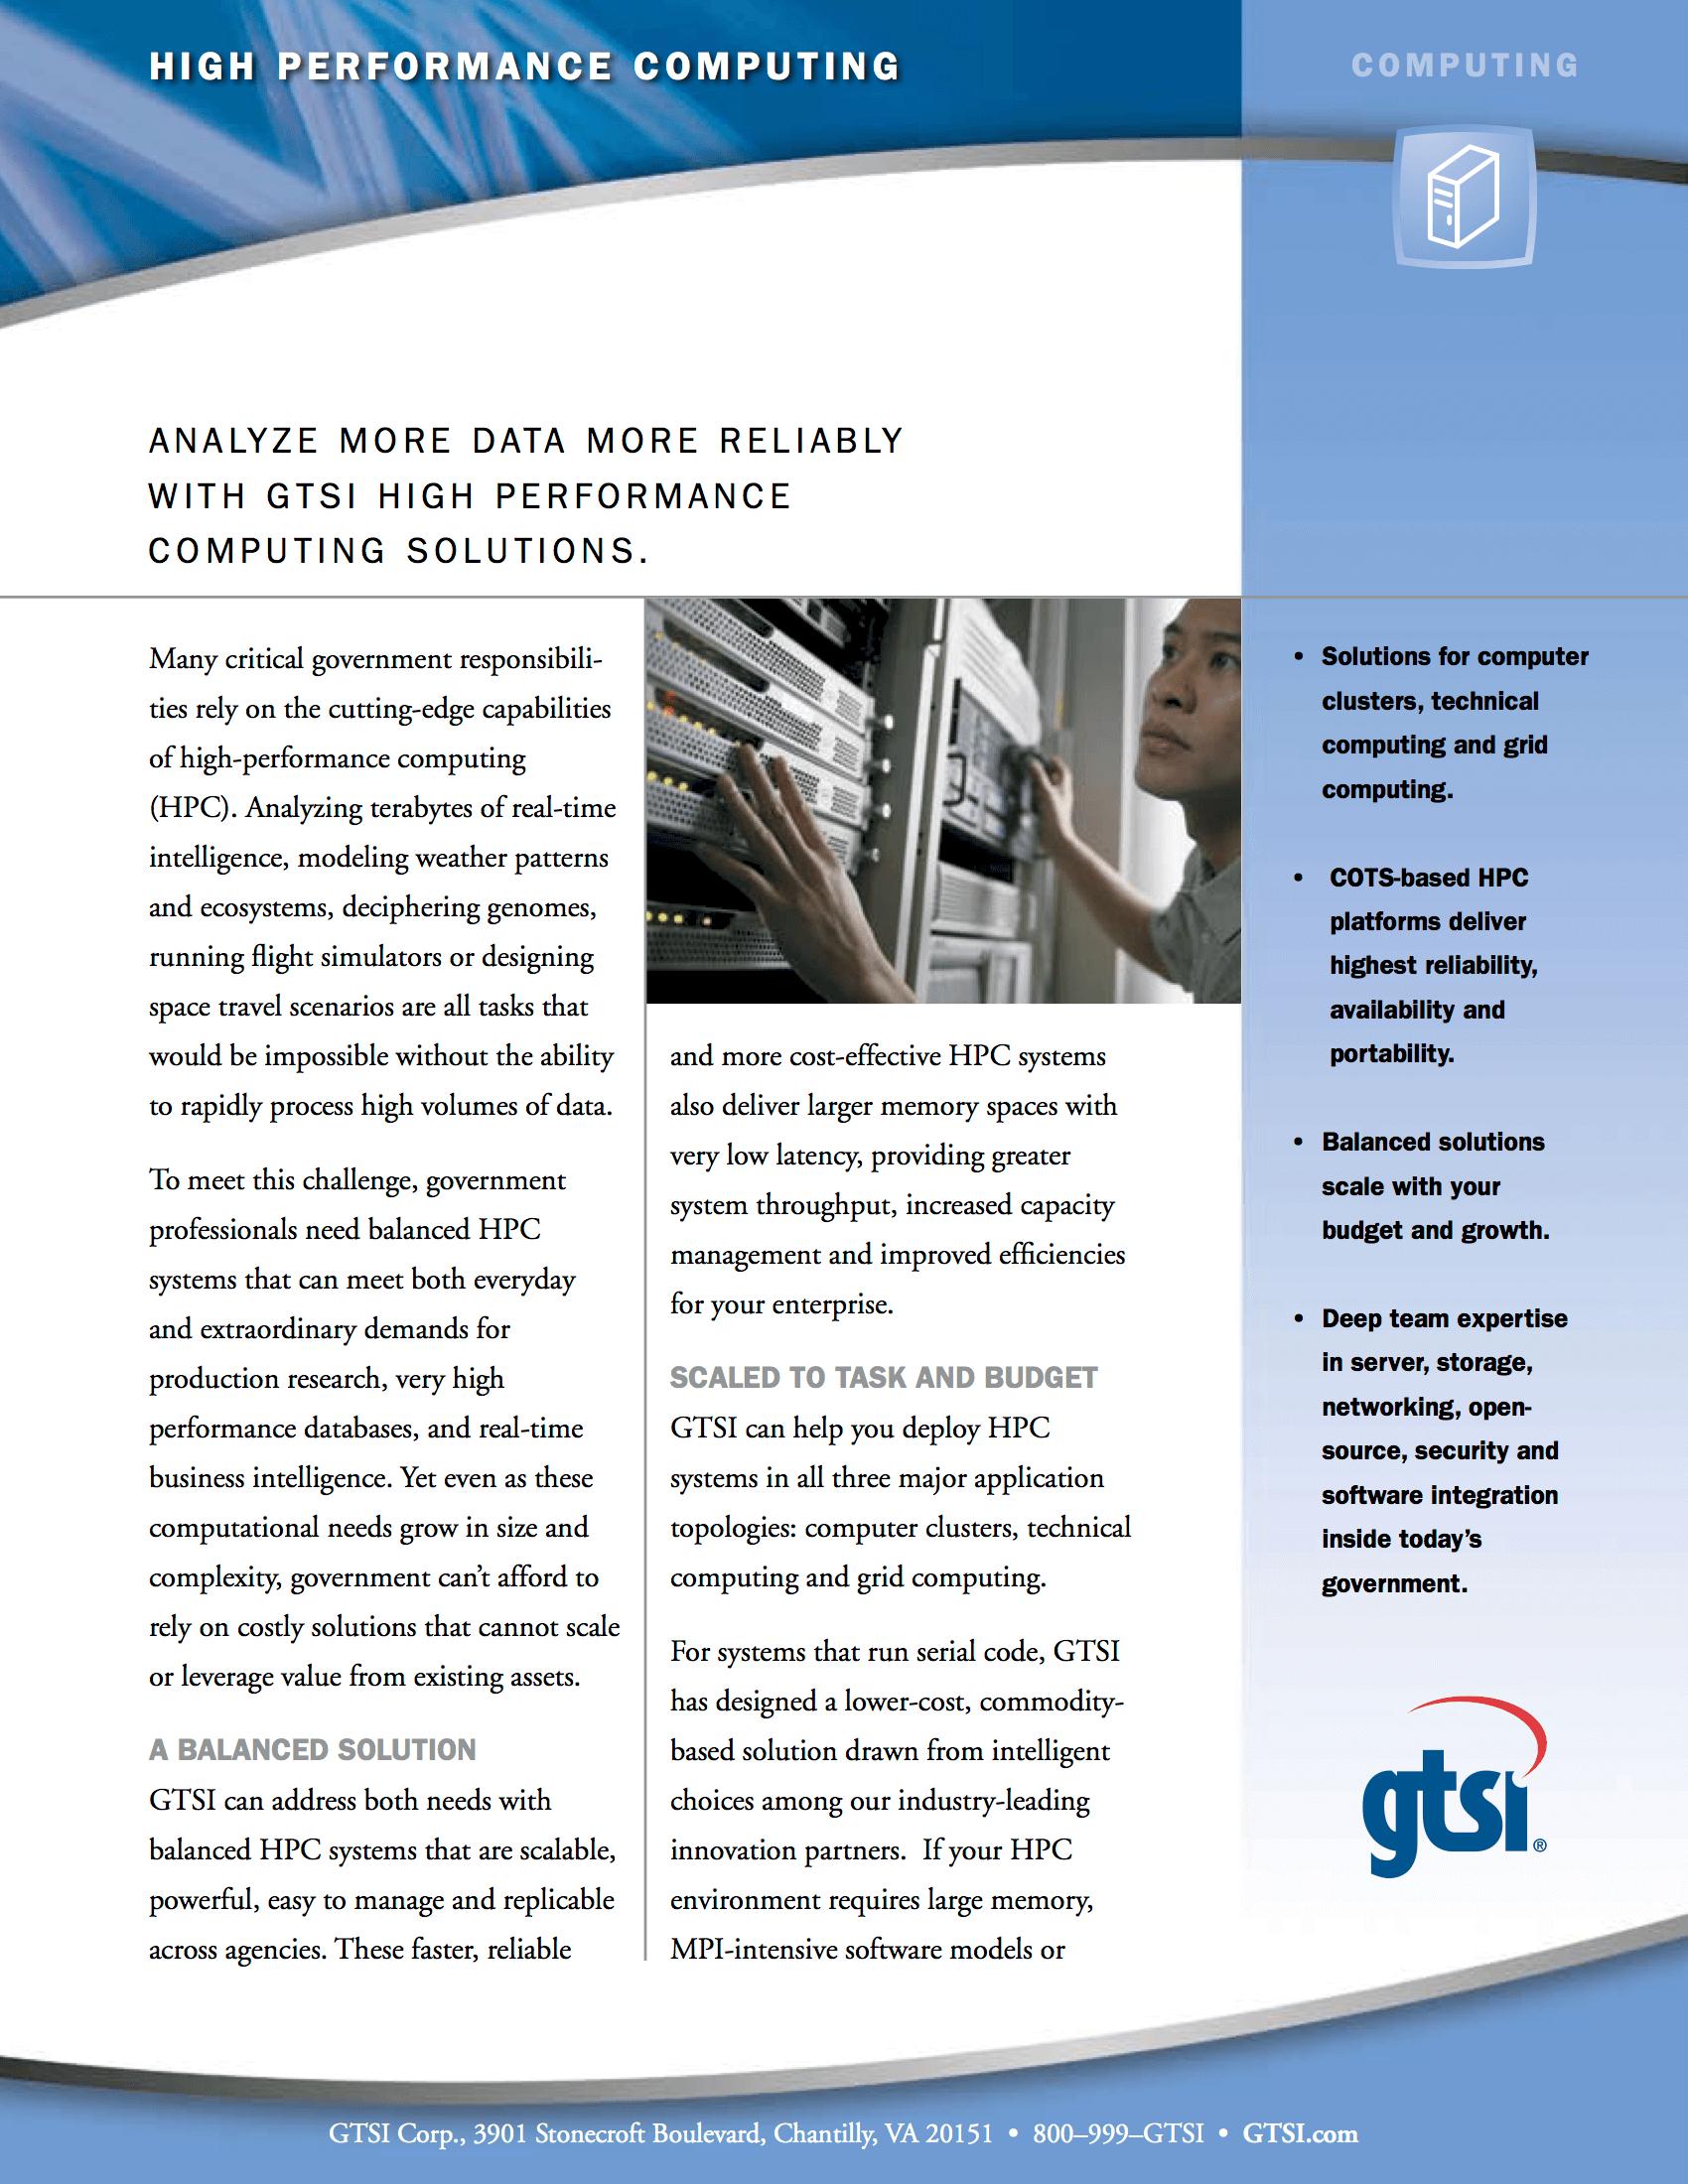 High Performance Computing data sheet